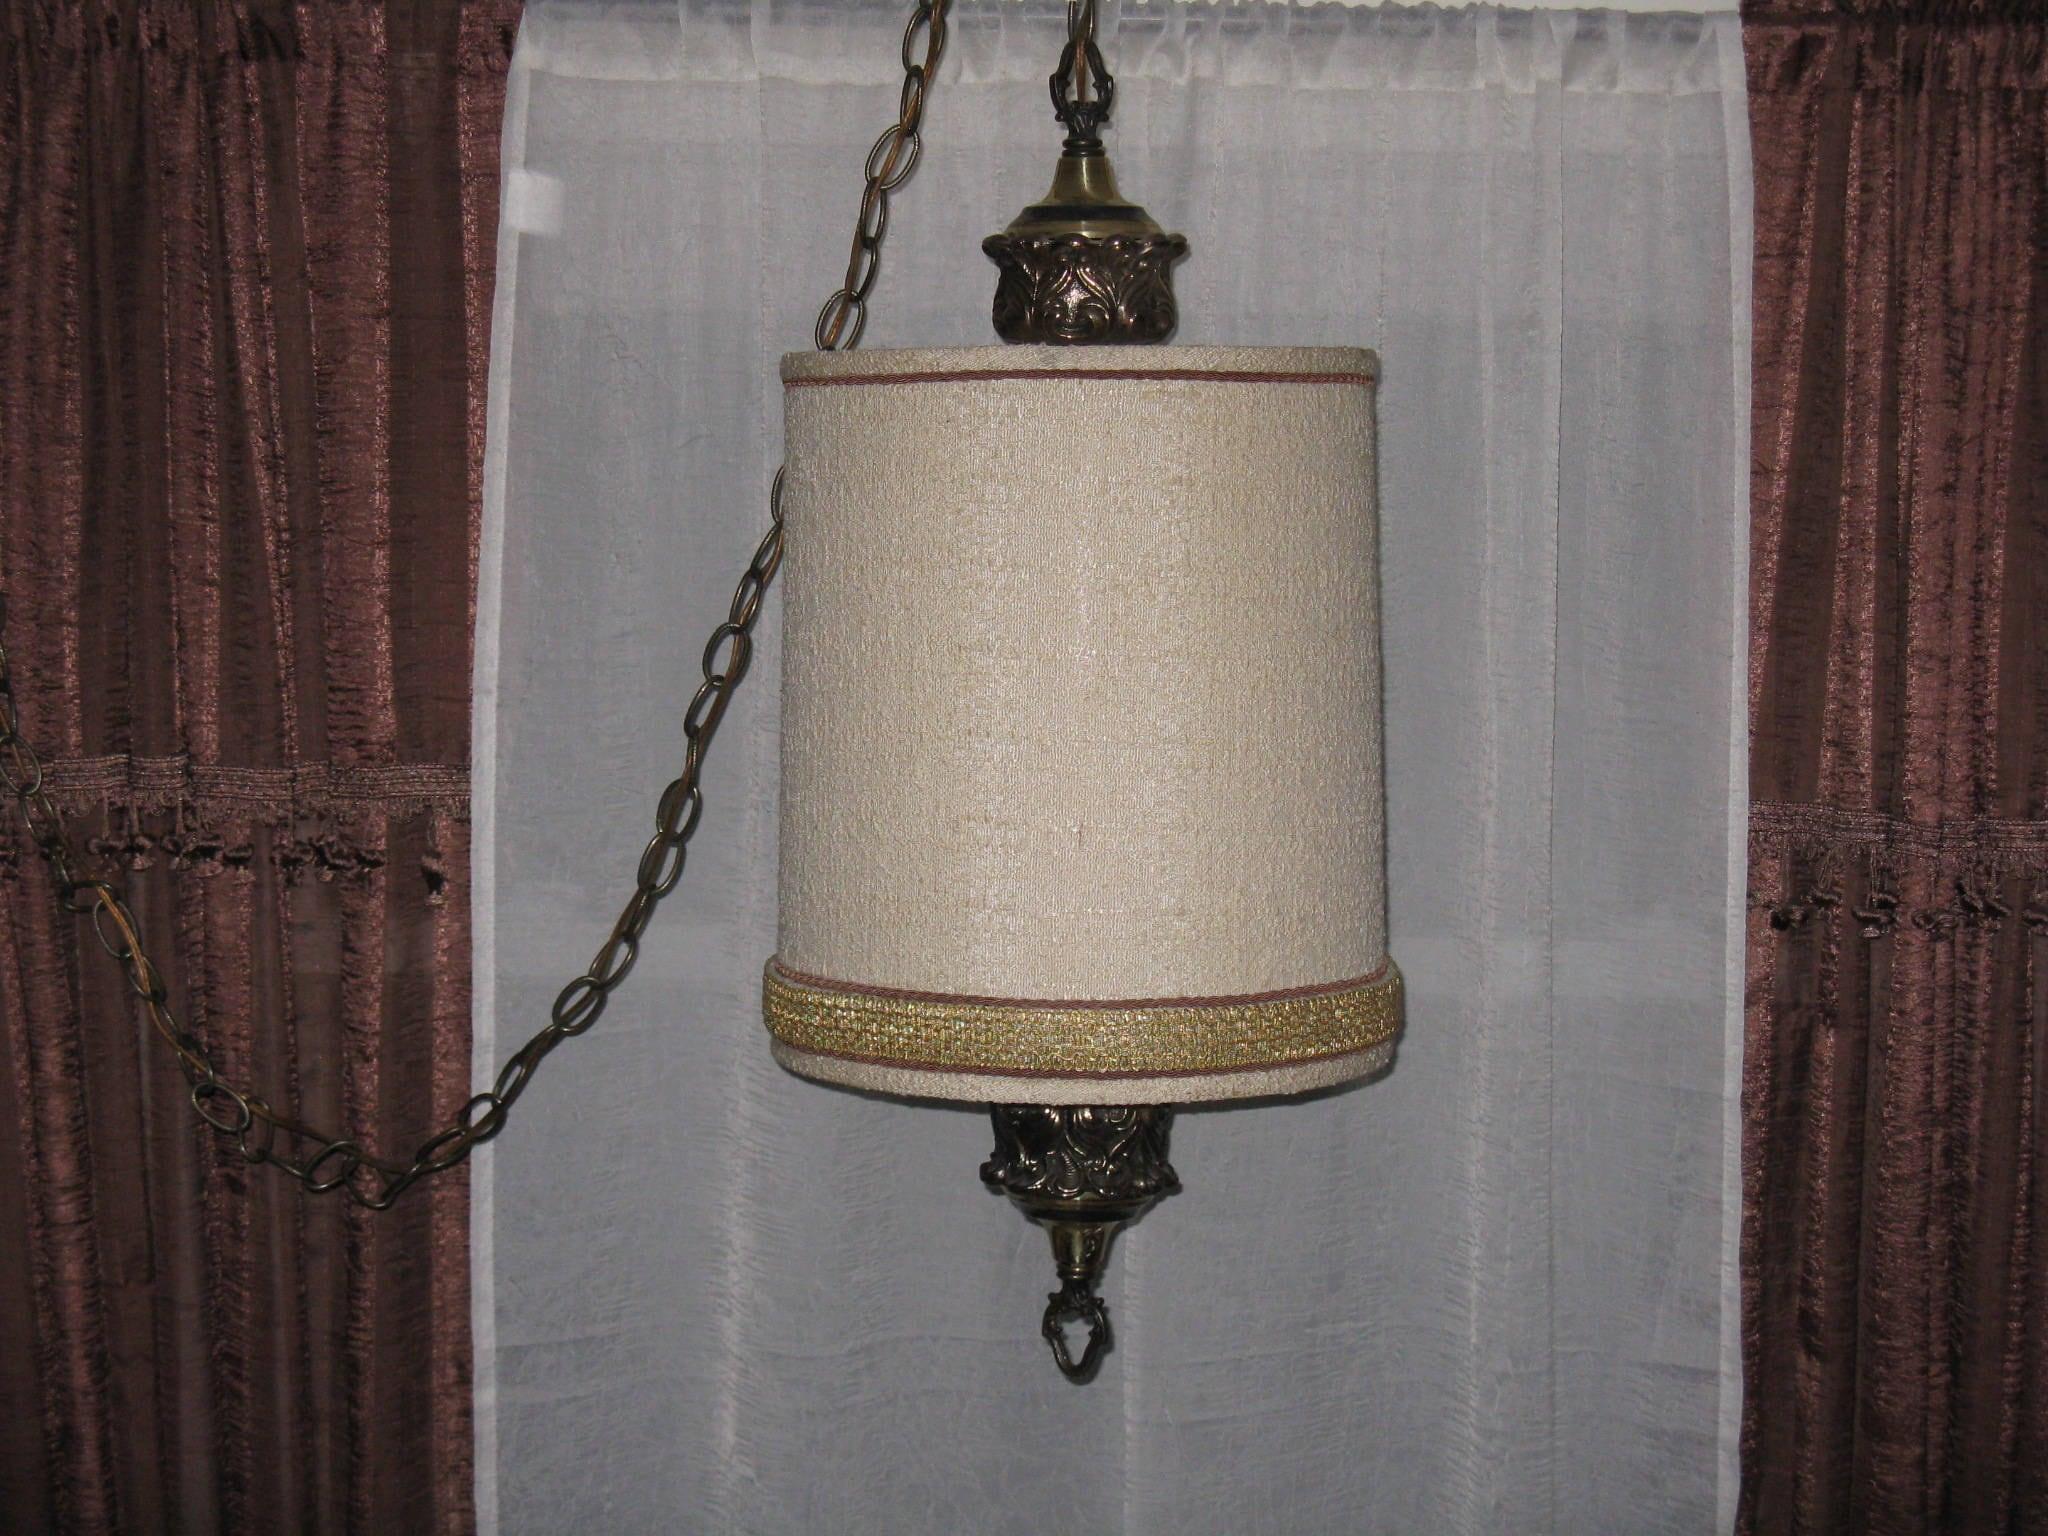 Vintage hanging swag lamp fabric shade 3 way bulb compatible